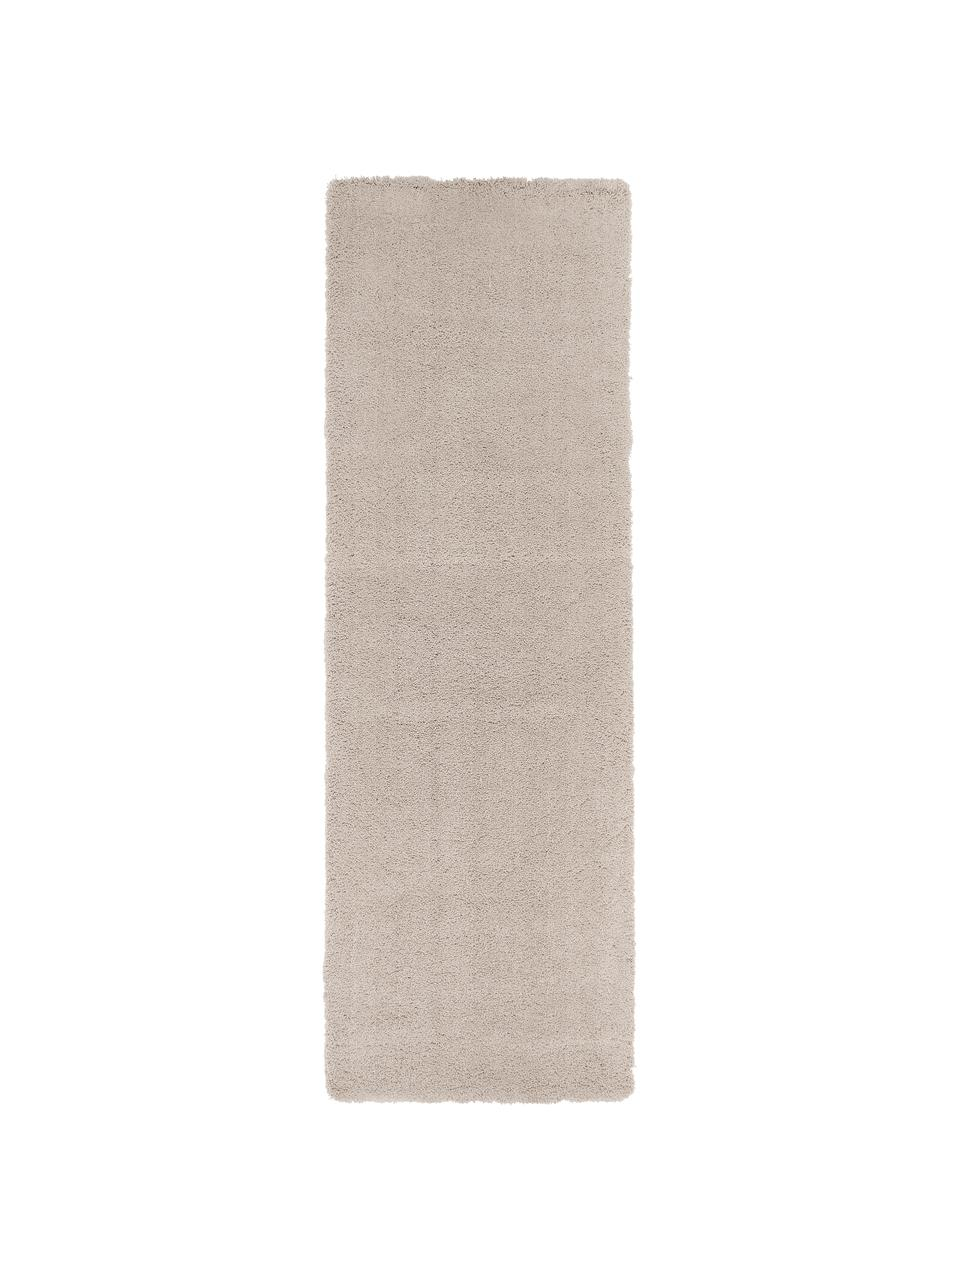 tapis de couloir a longs poils beige leighton